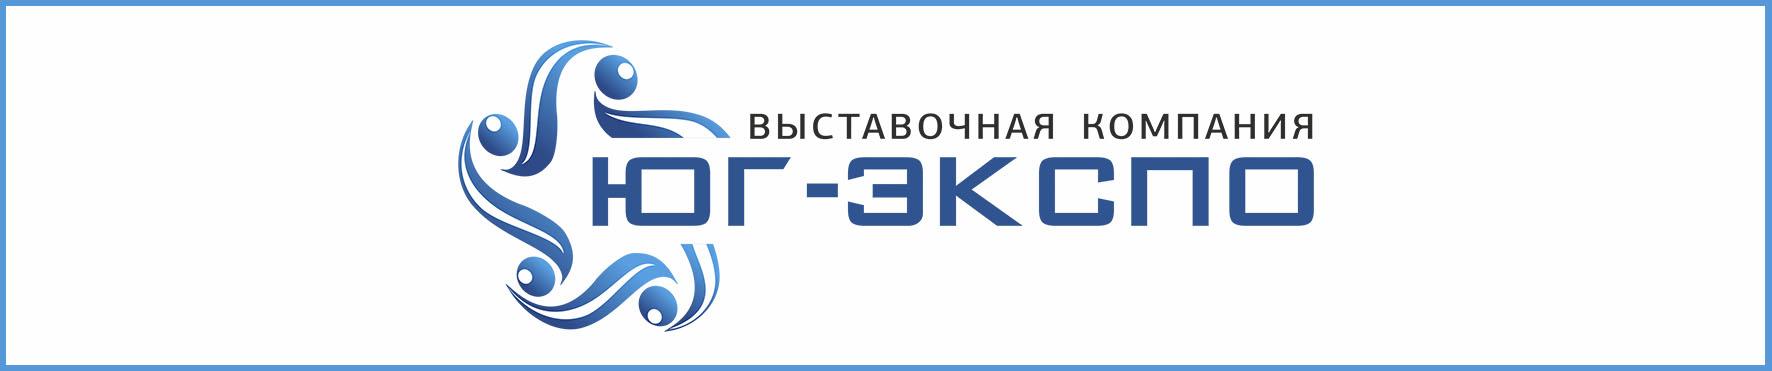 Реклама на конструкциях 3х6